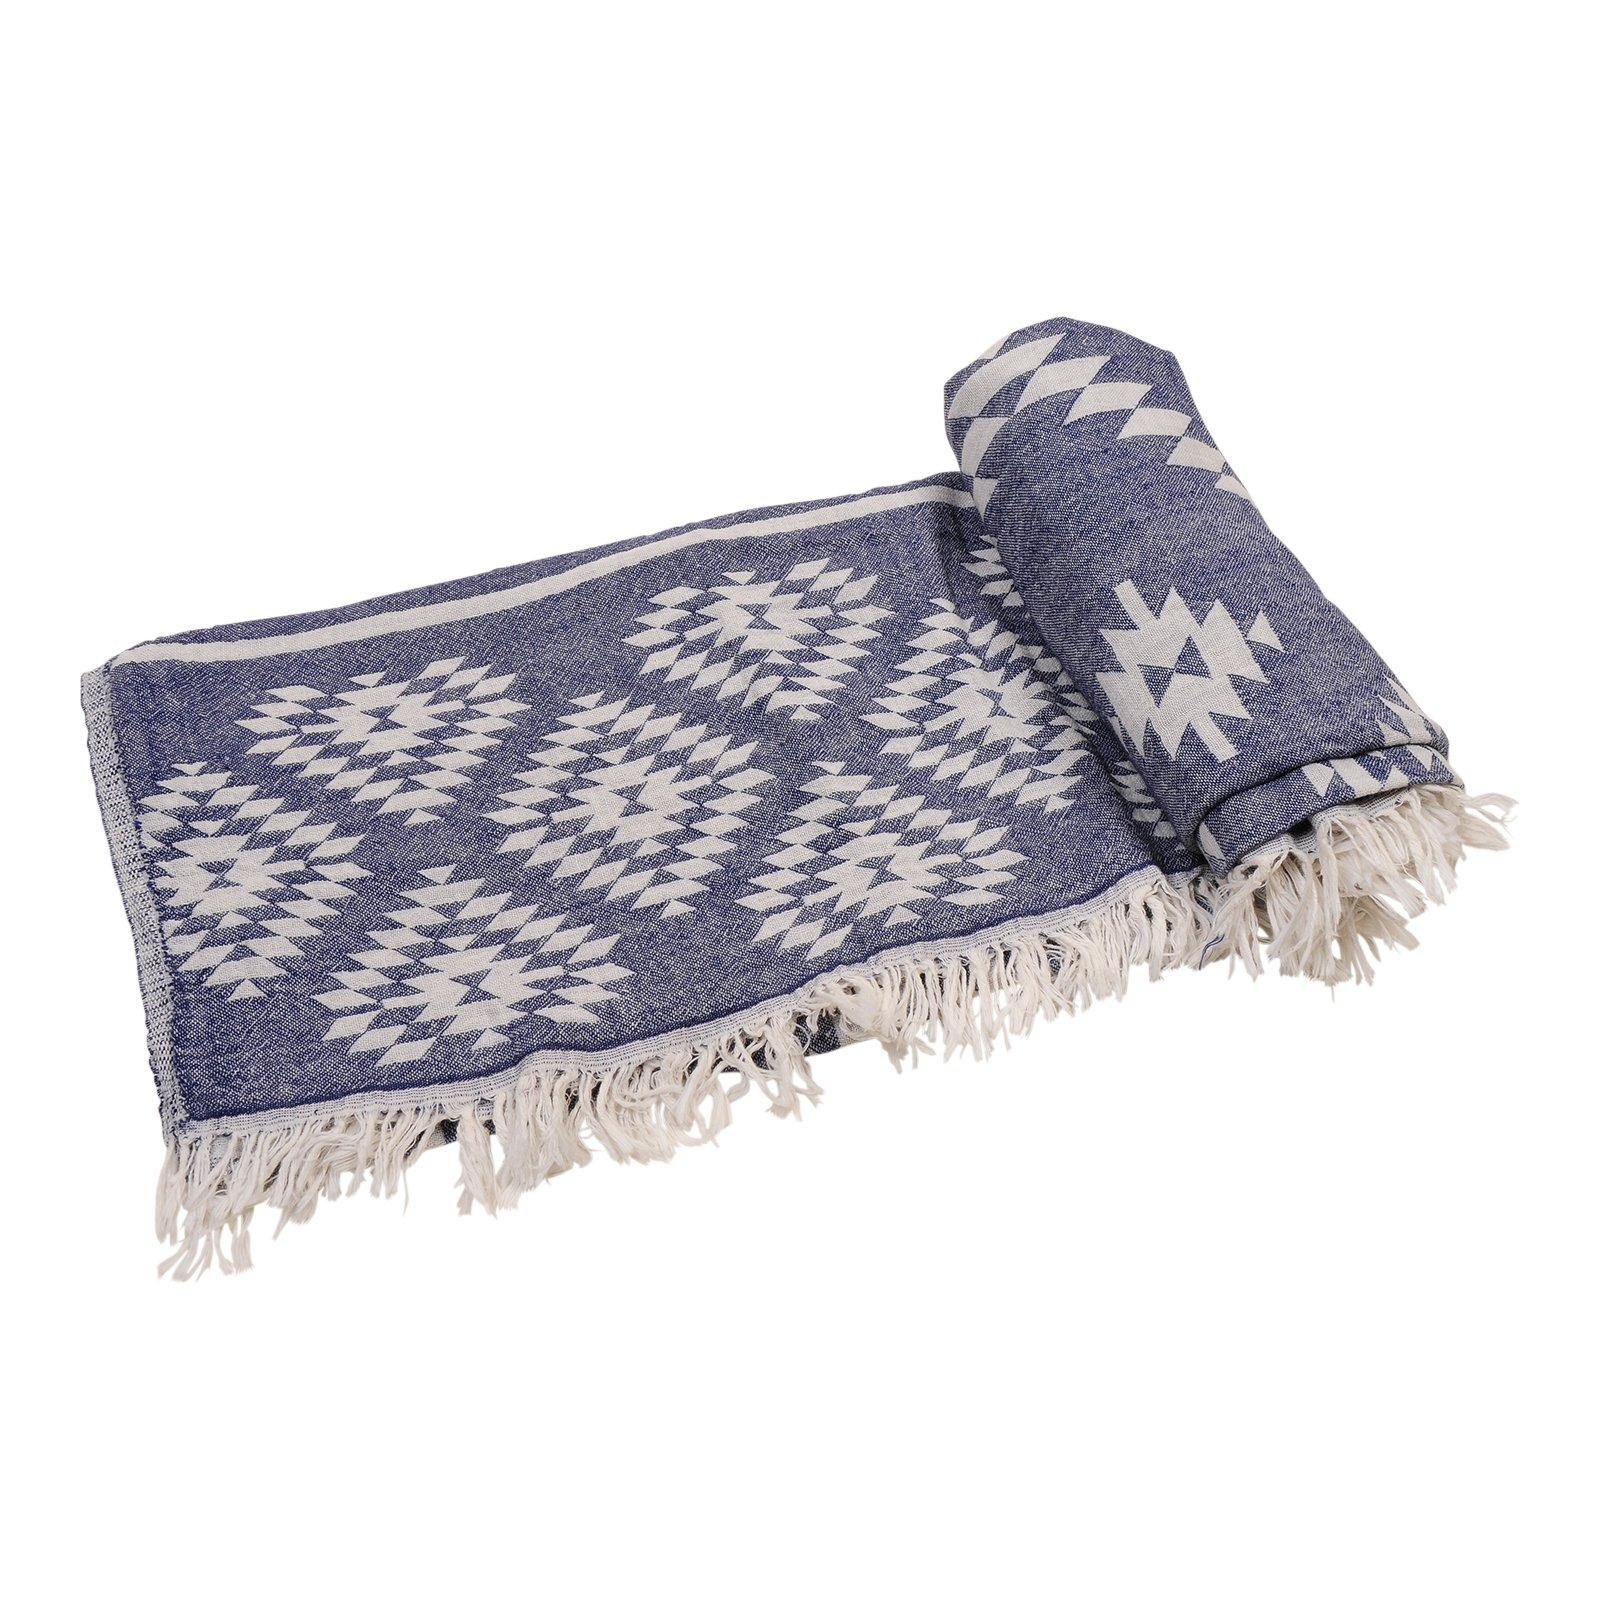 Anatolia Towel 100 Cotton Multi Purpose Turkish Towel